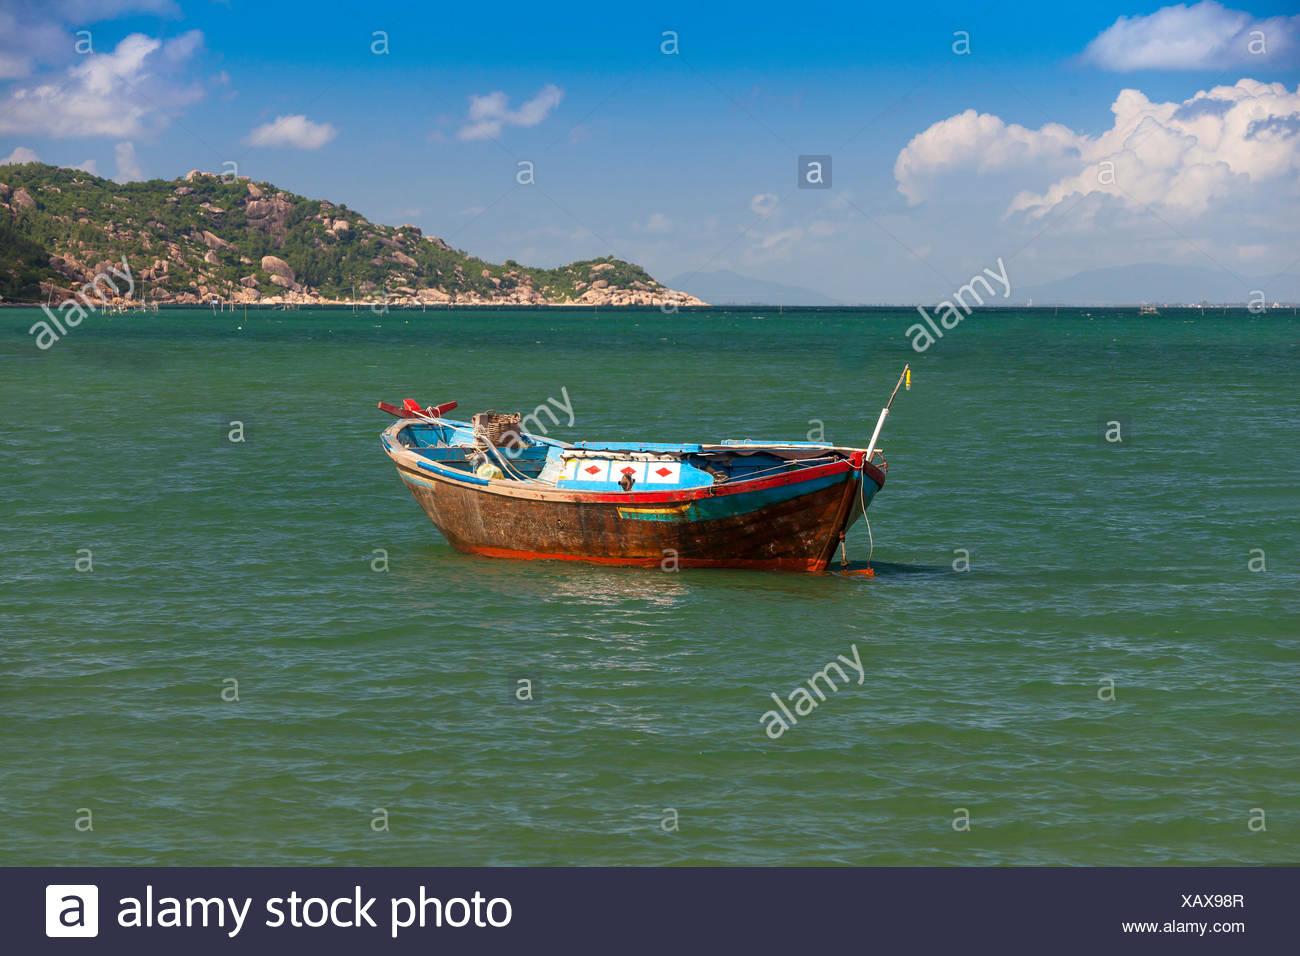 Fishing boat, Hon, Mun, bay, Vinpearl, island, South China Sea, sea, Asian, Asia, outside, mountains, mountainous, landscape, isl - Stock Image